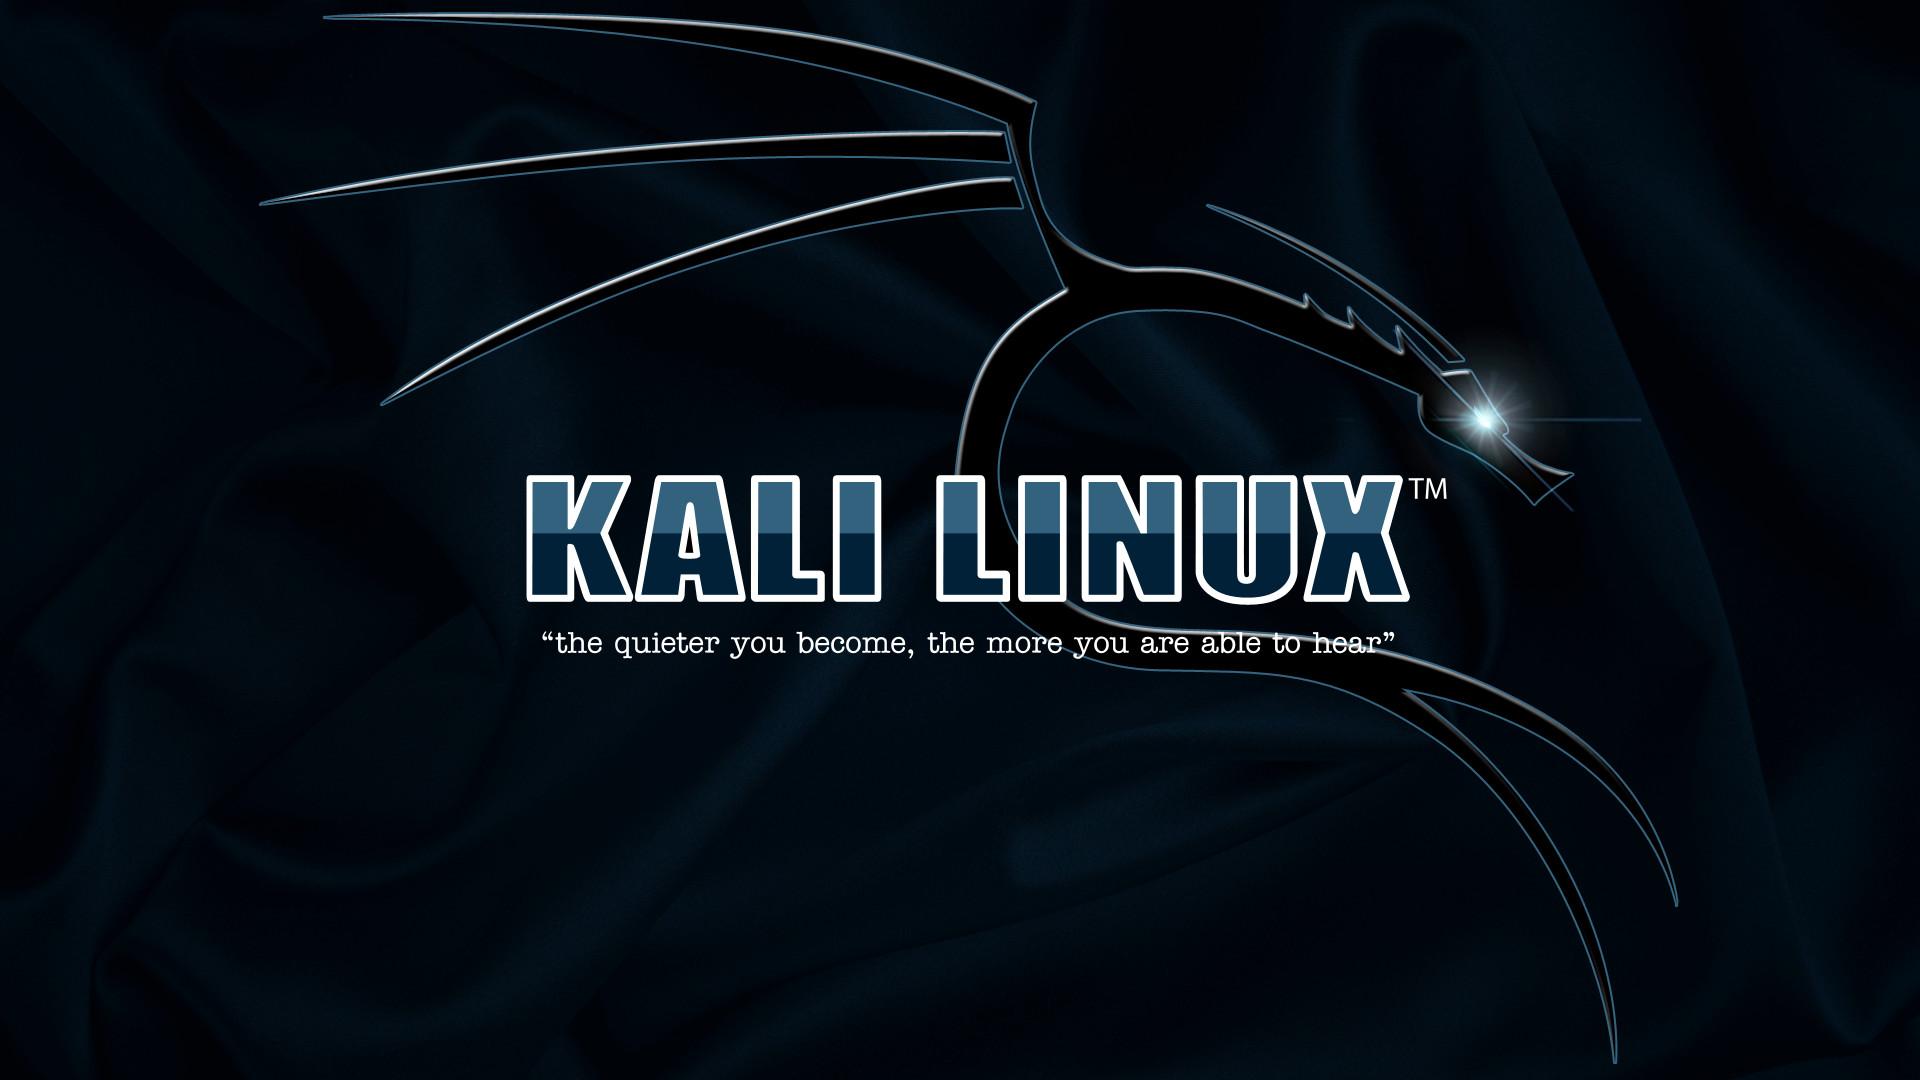 Kali Linux Wallpapers